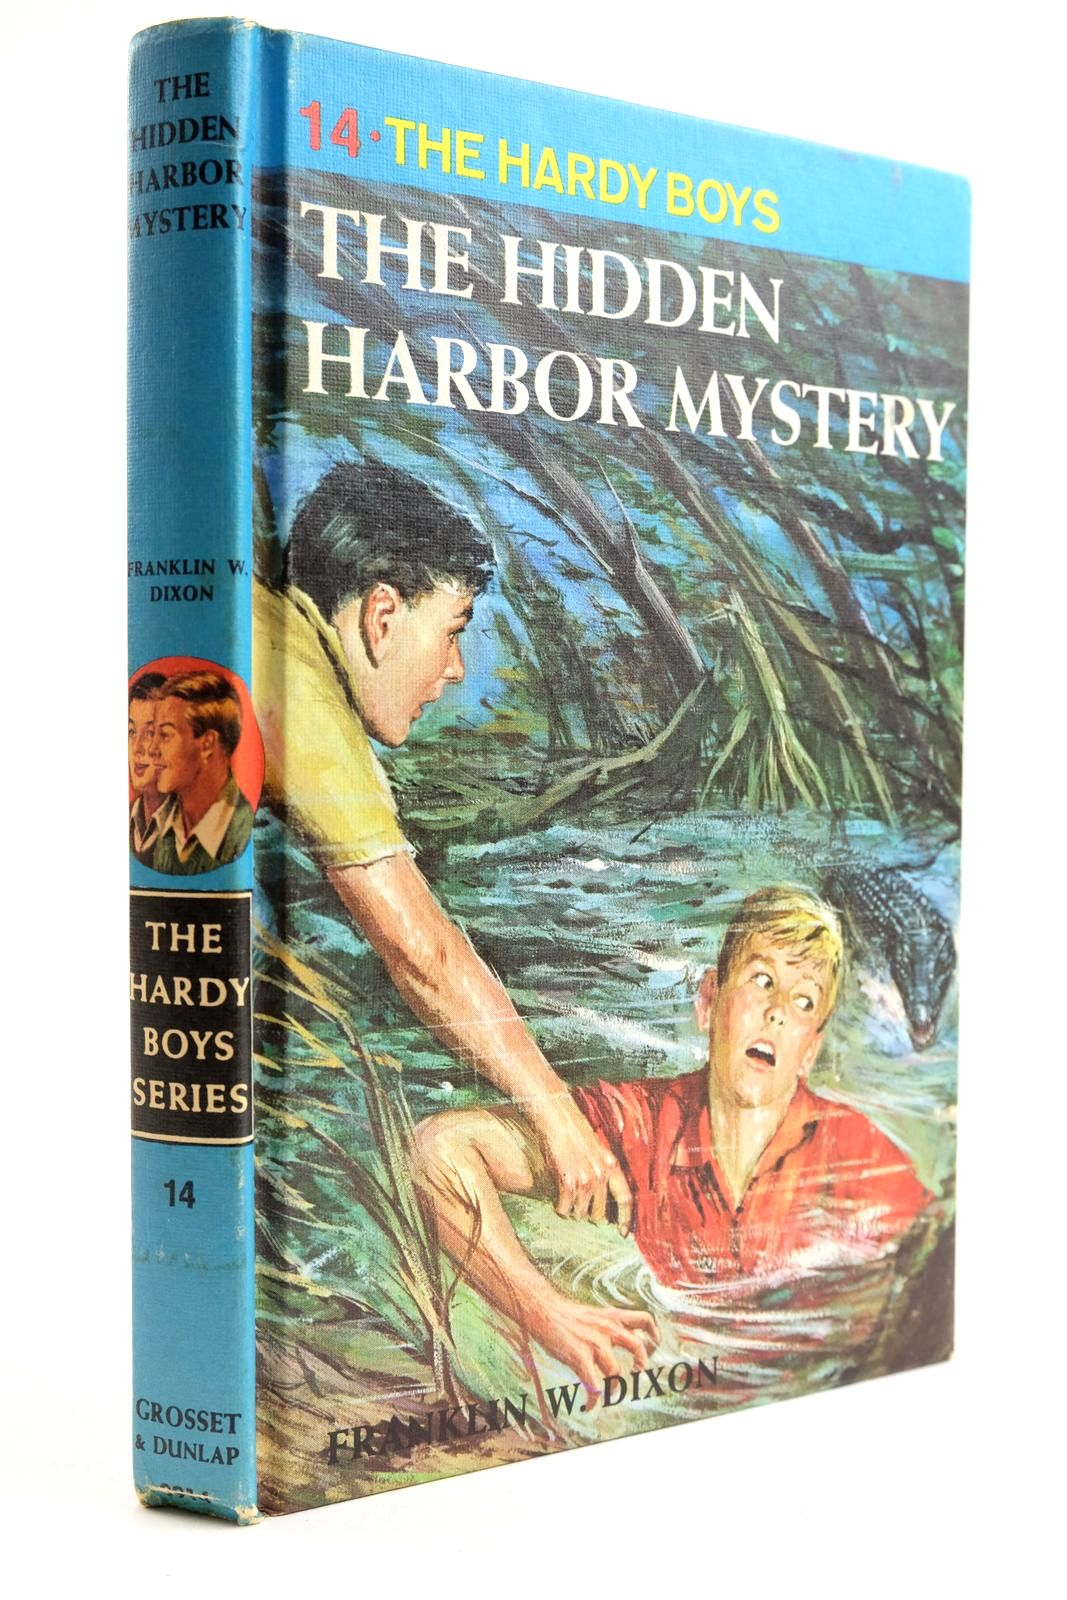 Photo of THE HIDDEN HARBOR MYSTERY